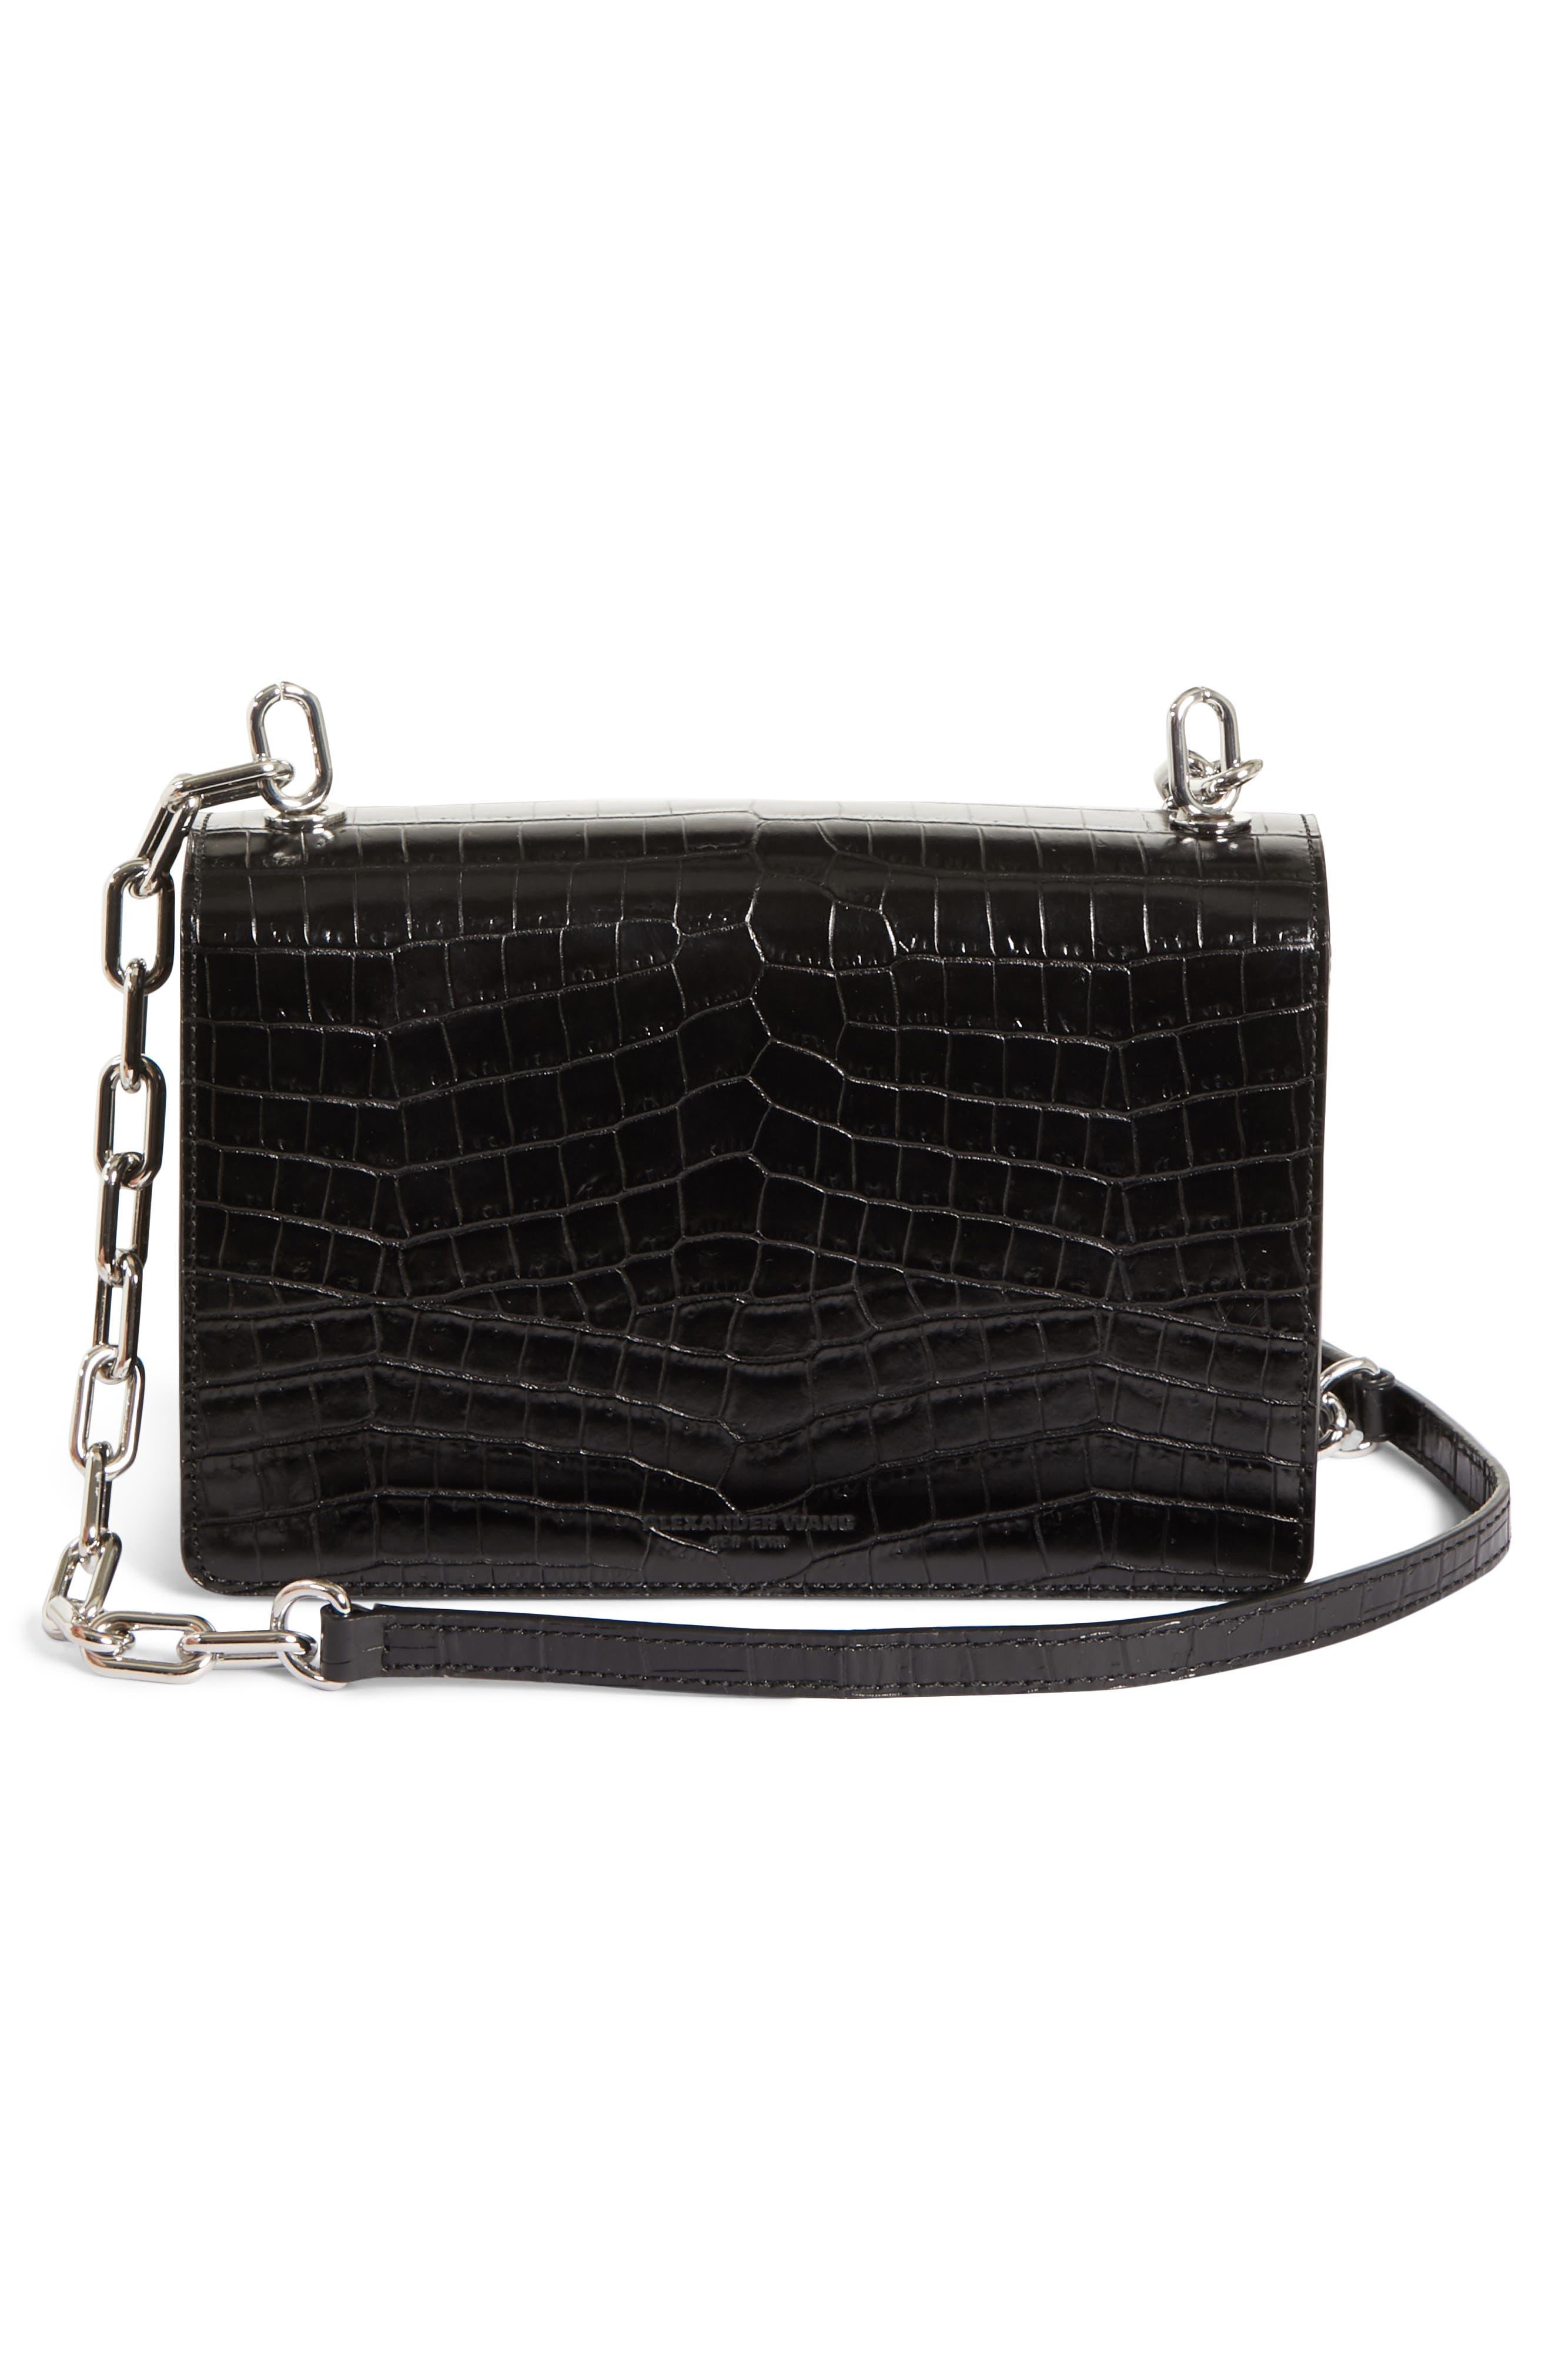 Hook Medium Leather Shoulder/Crossbody Bag,                             Alternate thumbnail 3, color,                             001